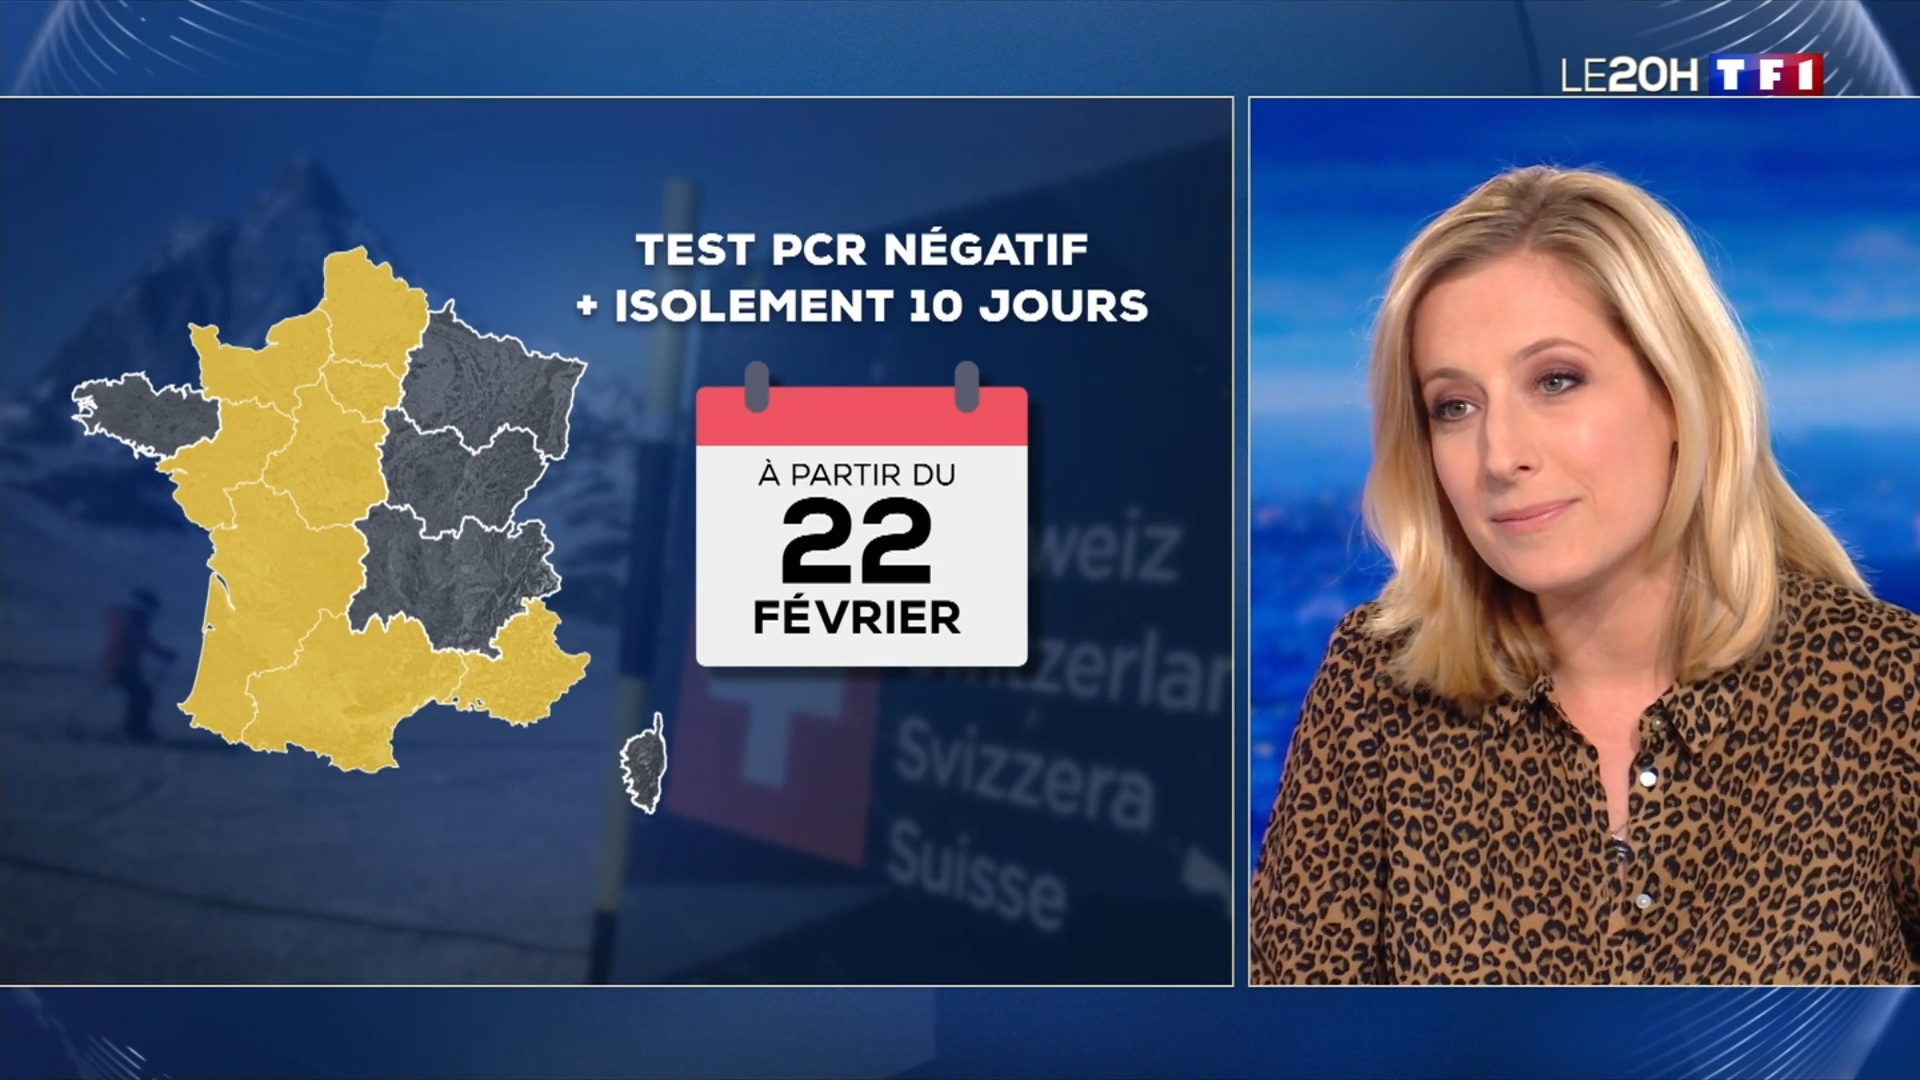 2021-02-10_20_00_TF1_Le-20h.mp4_snapshot_00.43.53.664.jpg